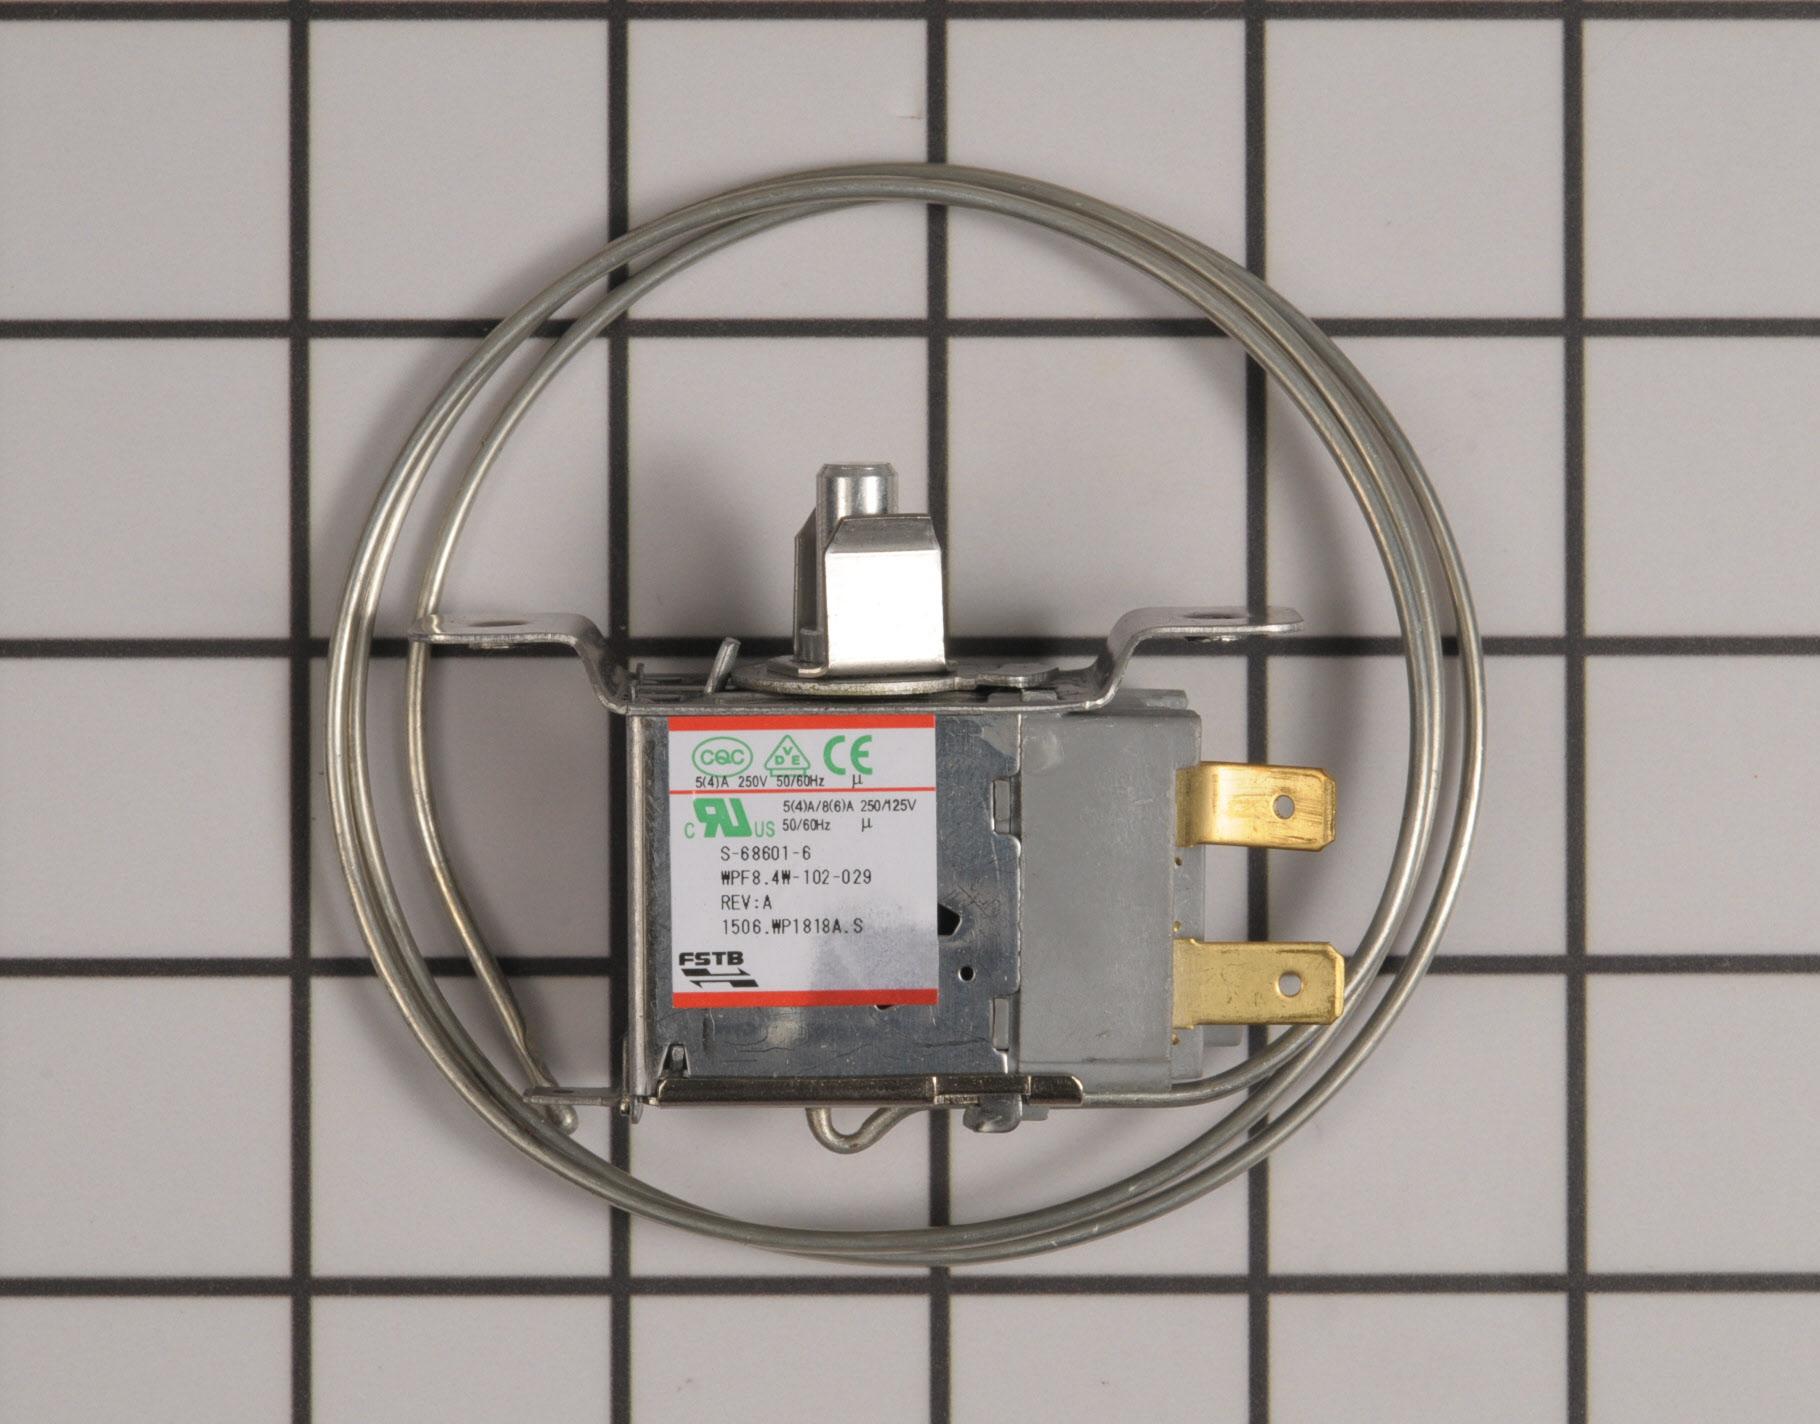 Kenmore Air Conditioner Part # WP68601 - Temperature Control Thermostat